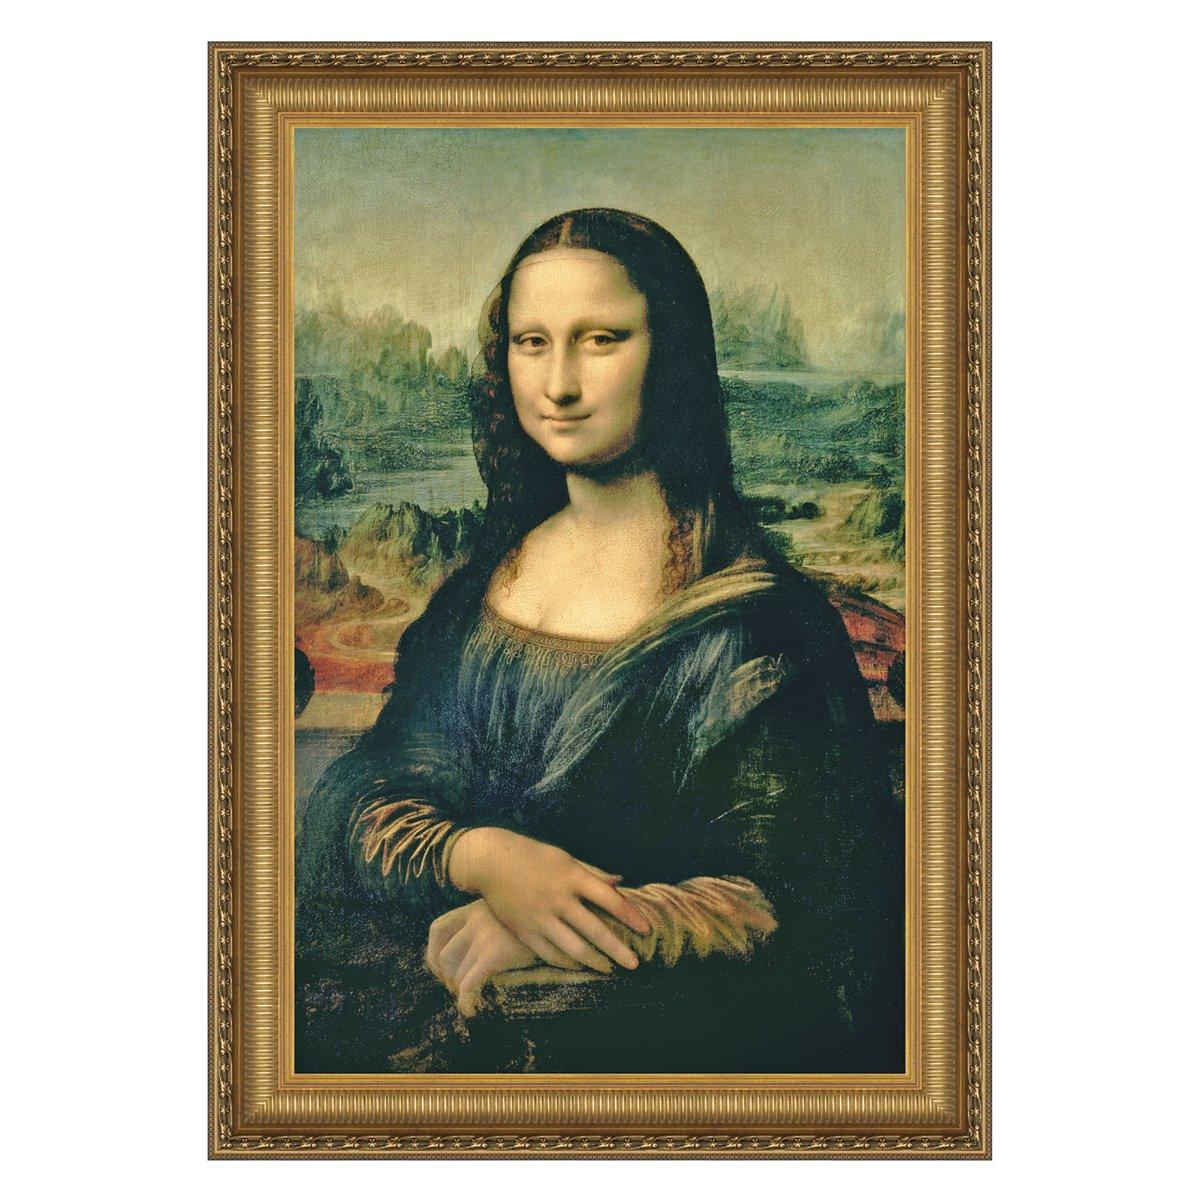 Design Toscano Mona Lisa, 1503-1506 Canvas Replica Painting: Medium